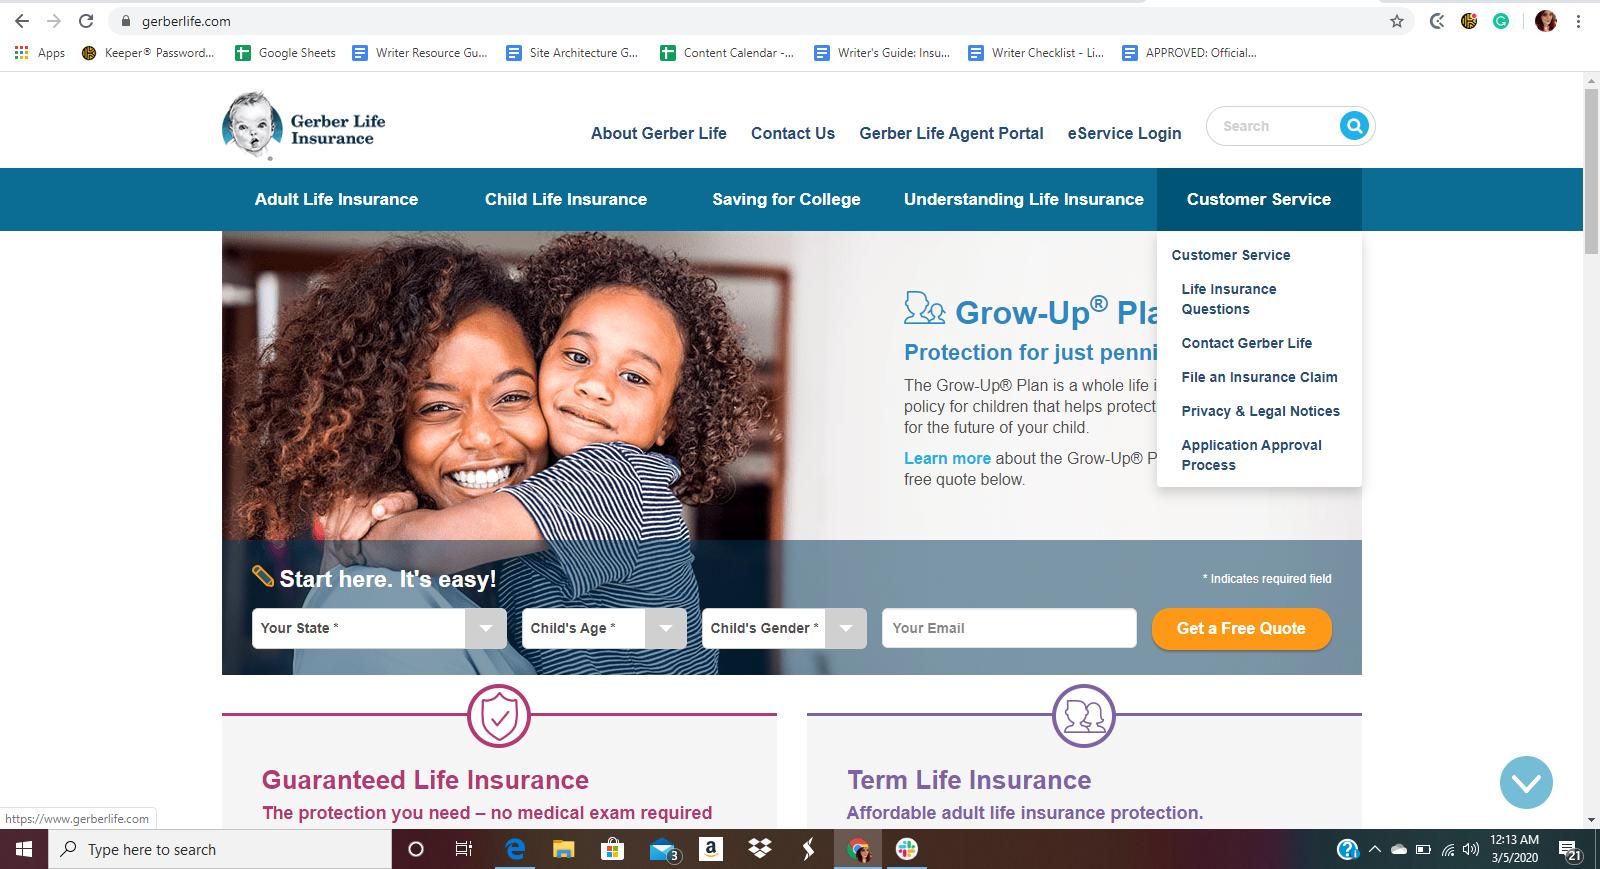 Gerber Life Website Home Page Customer Service Menu Dropdown